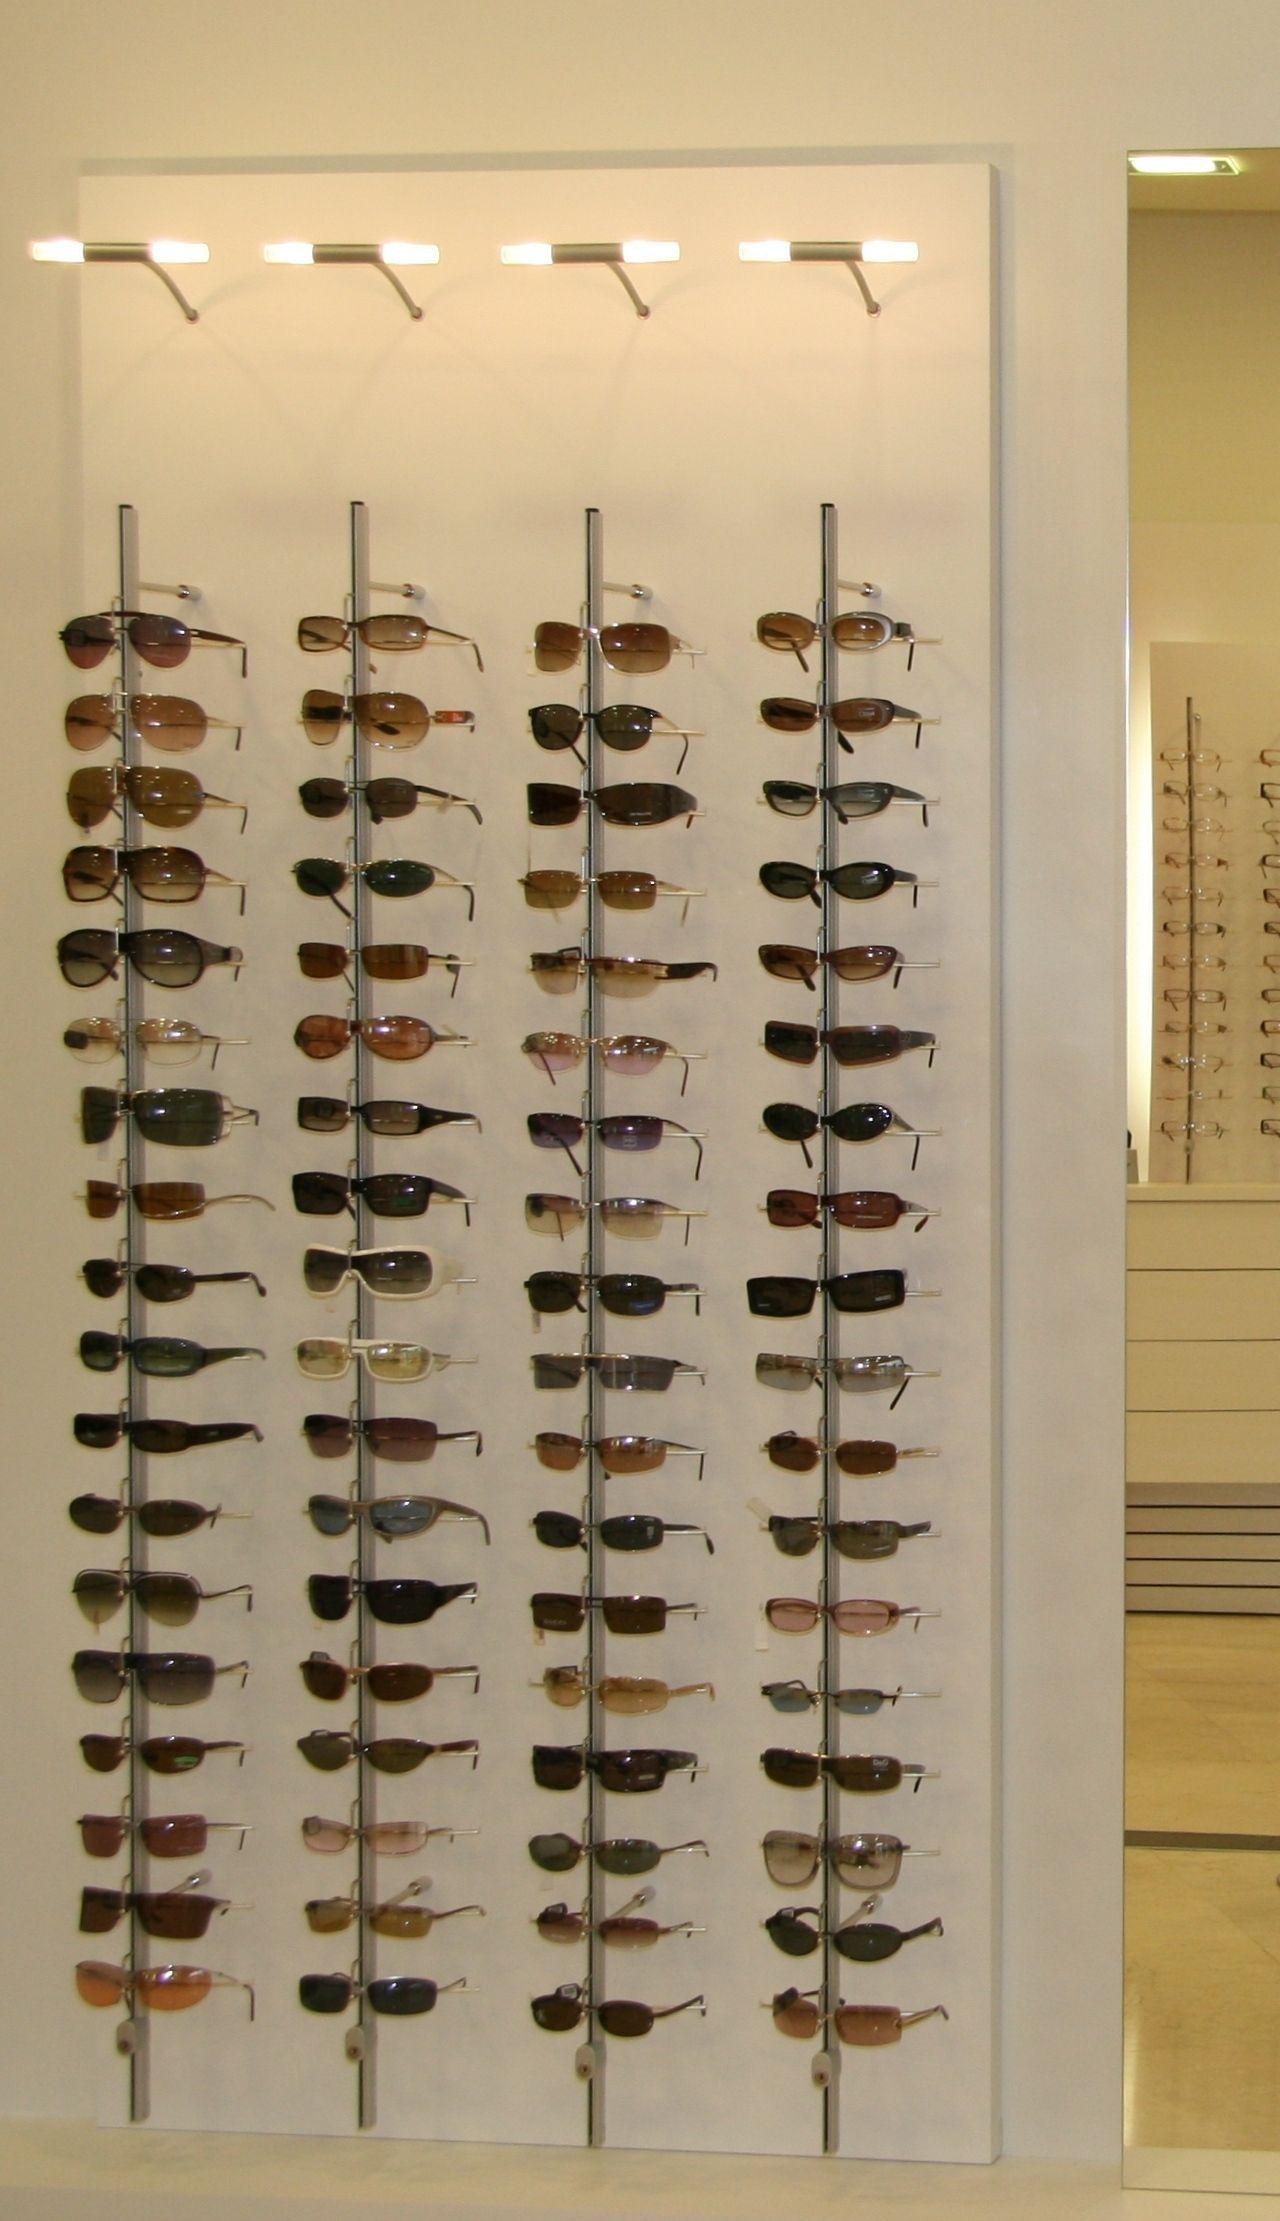 Mobiliario A Medida Para Farmacias Opticas Perfumerias Joyerias